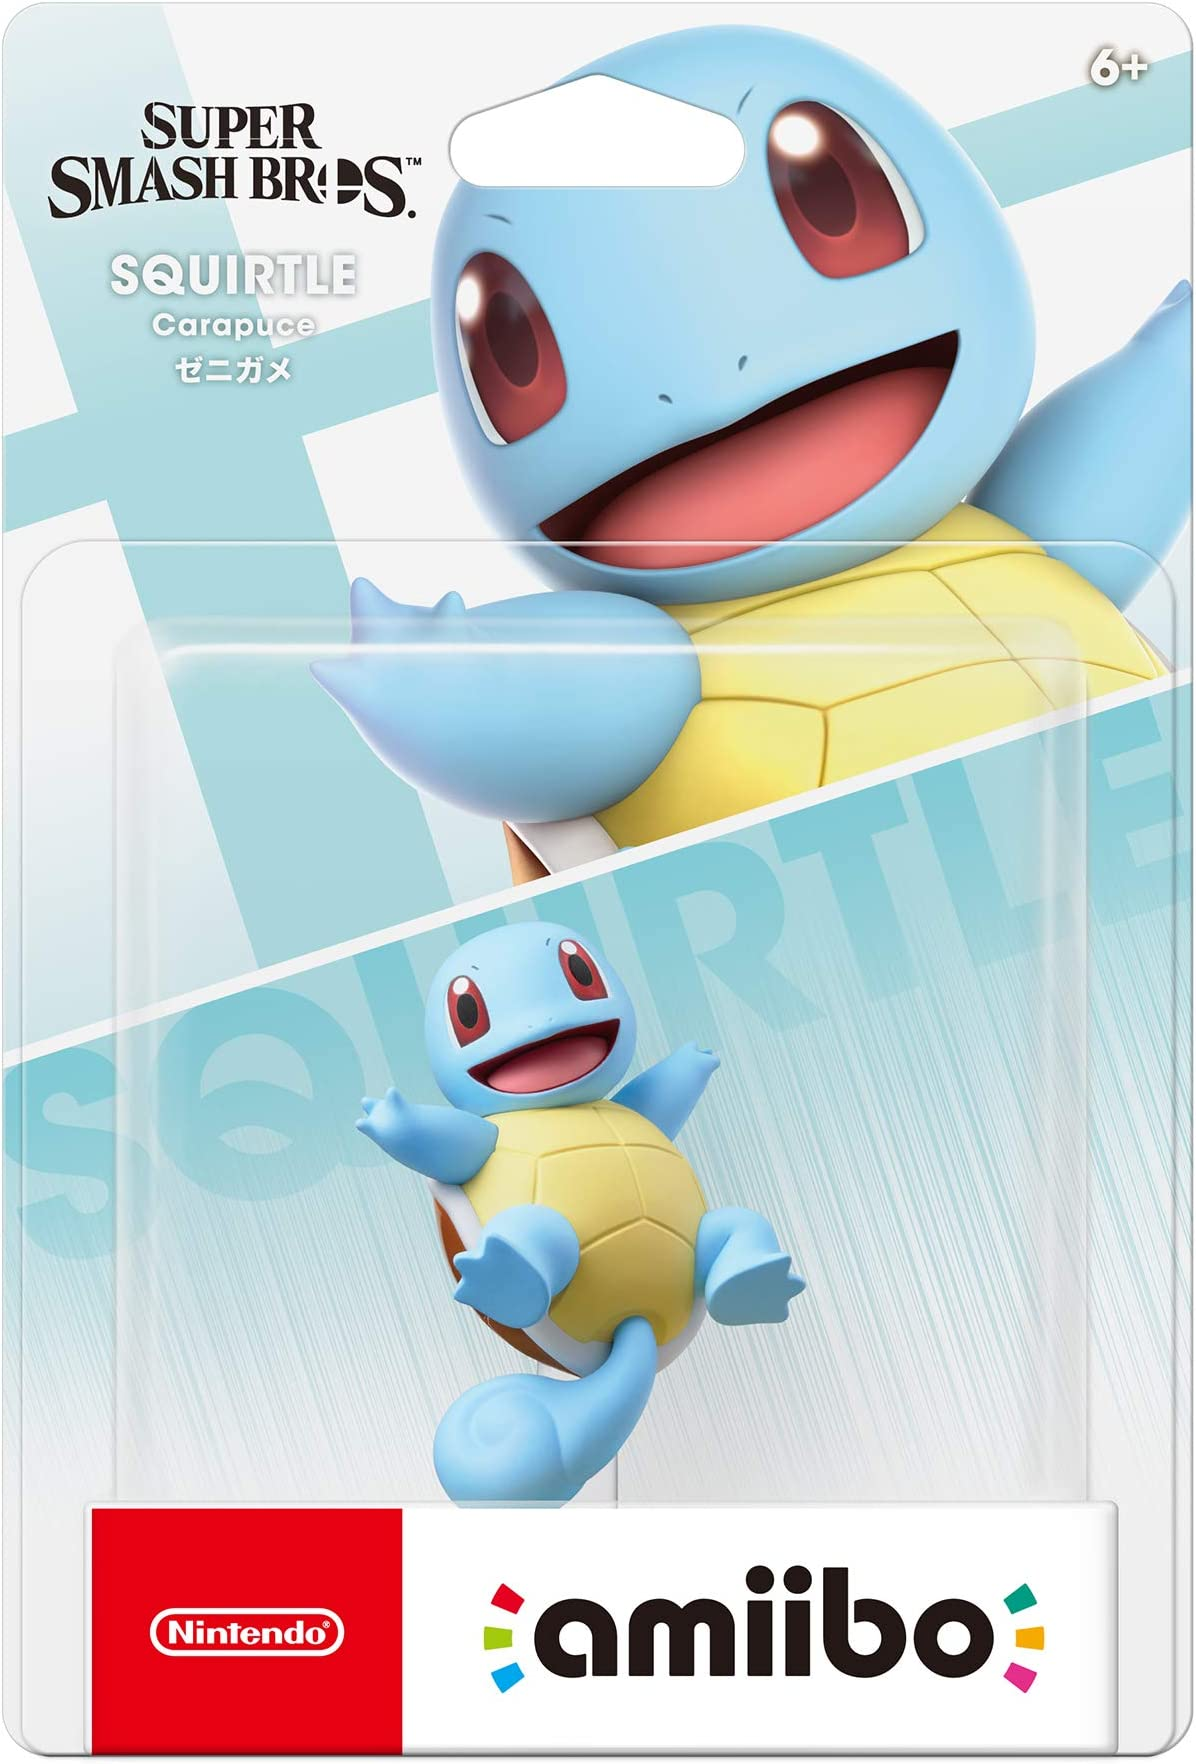 Amazon.com: Nintendo Amiibo - Squirtle - Super Smash Bros ...